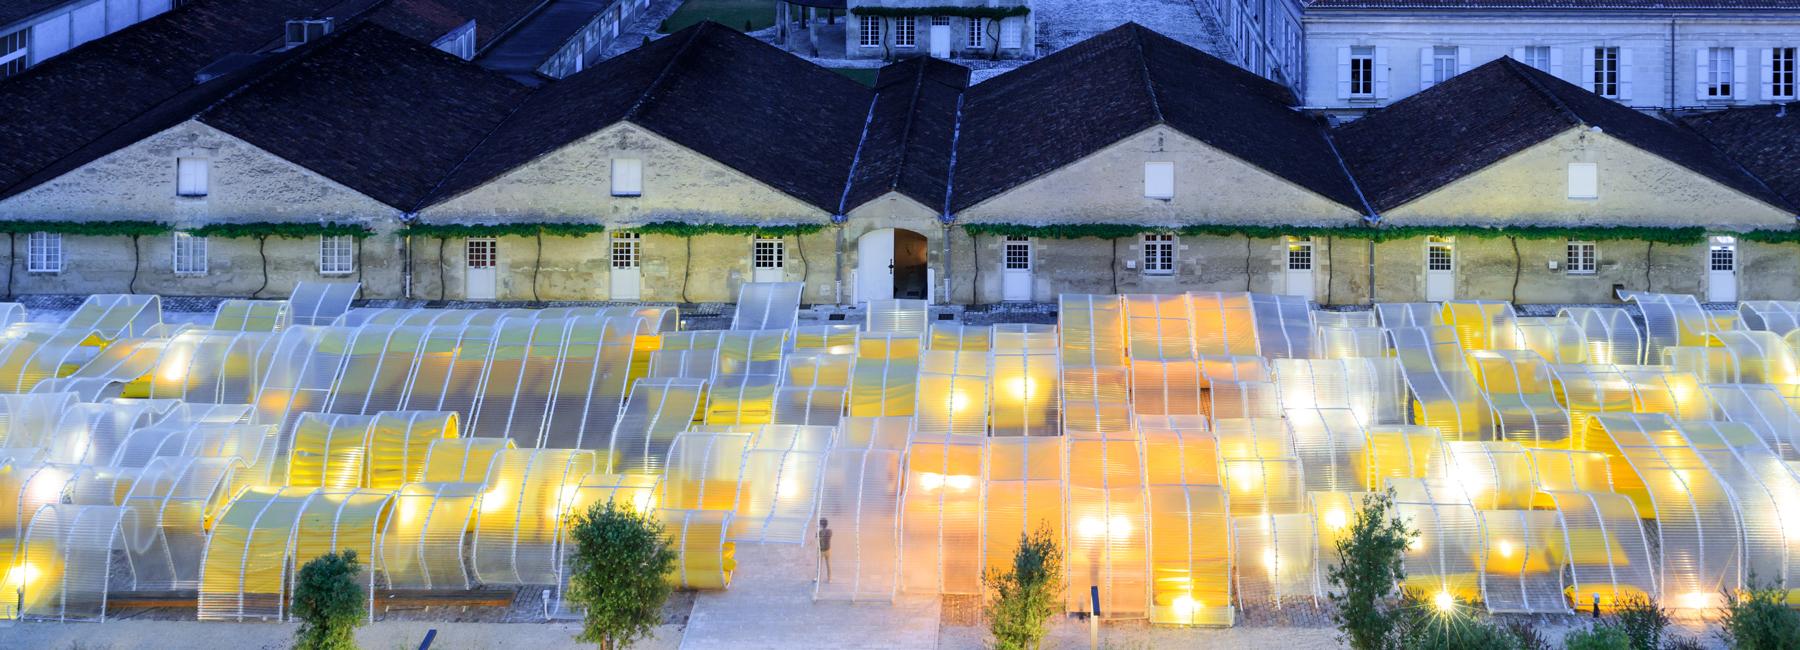 selgascano-pavilion-martell-cognac-designboom-011.jpg